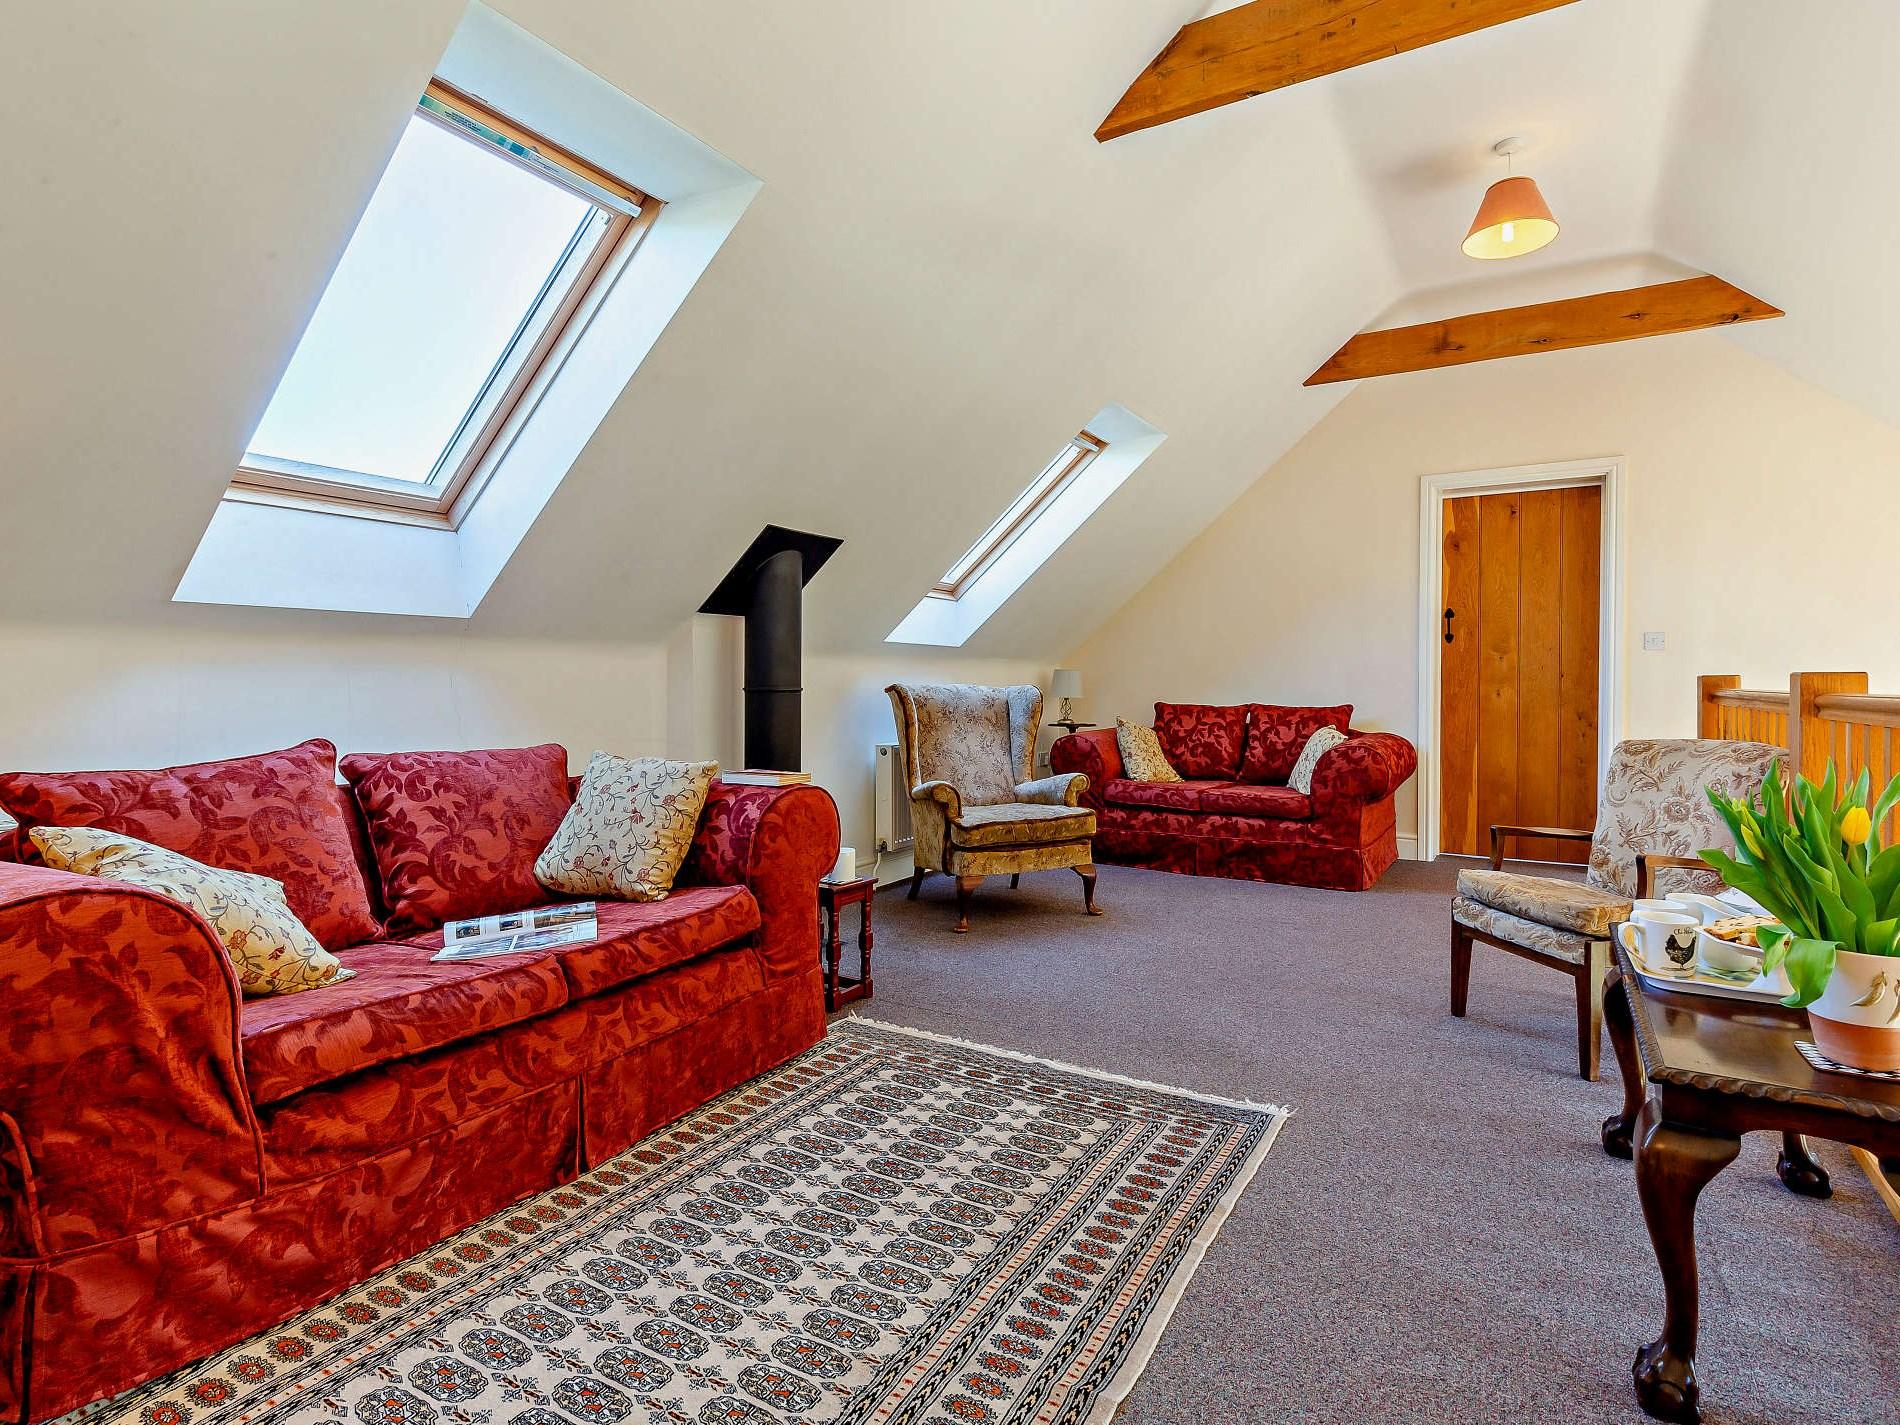 3 Bedroom Barn in Norfolk, East Anglia